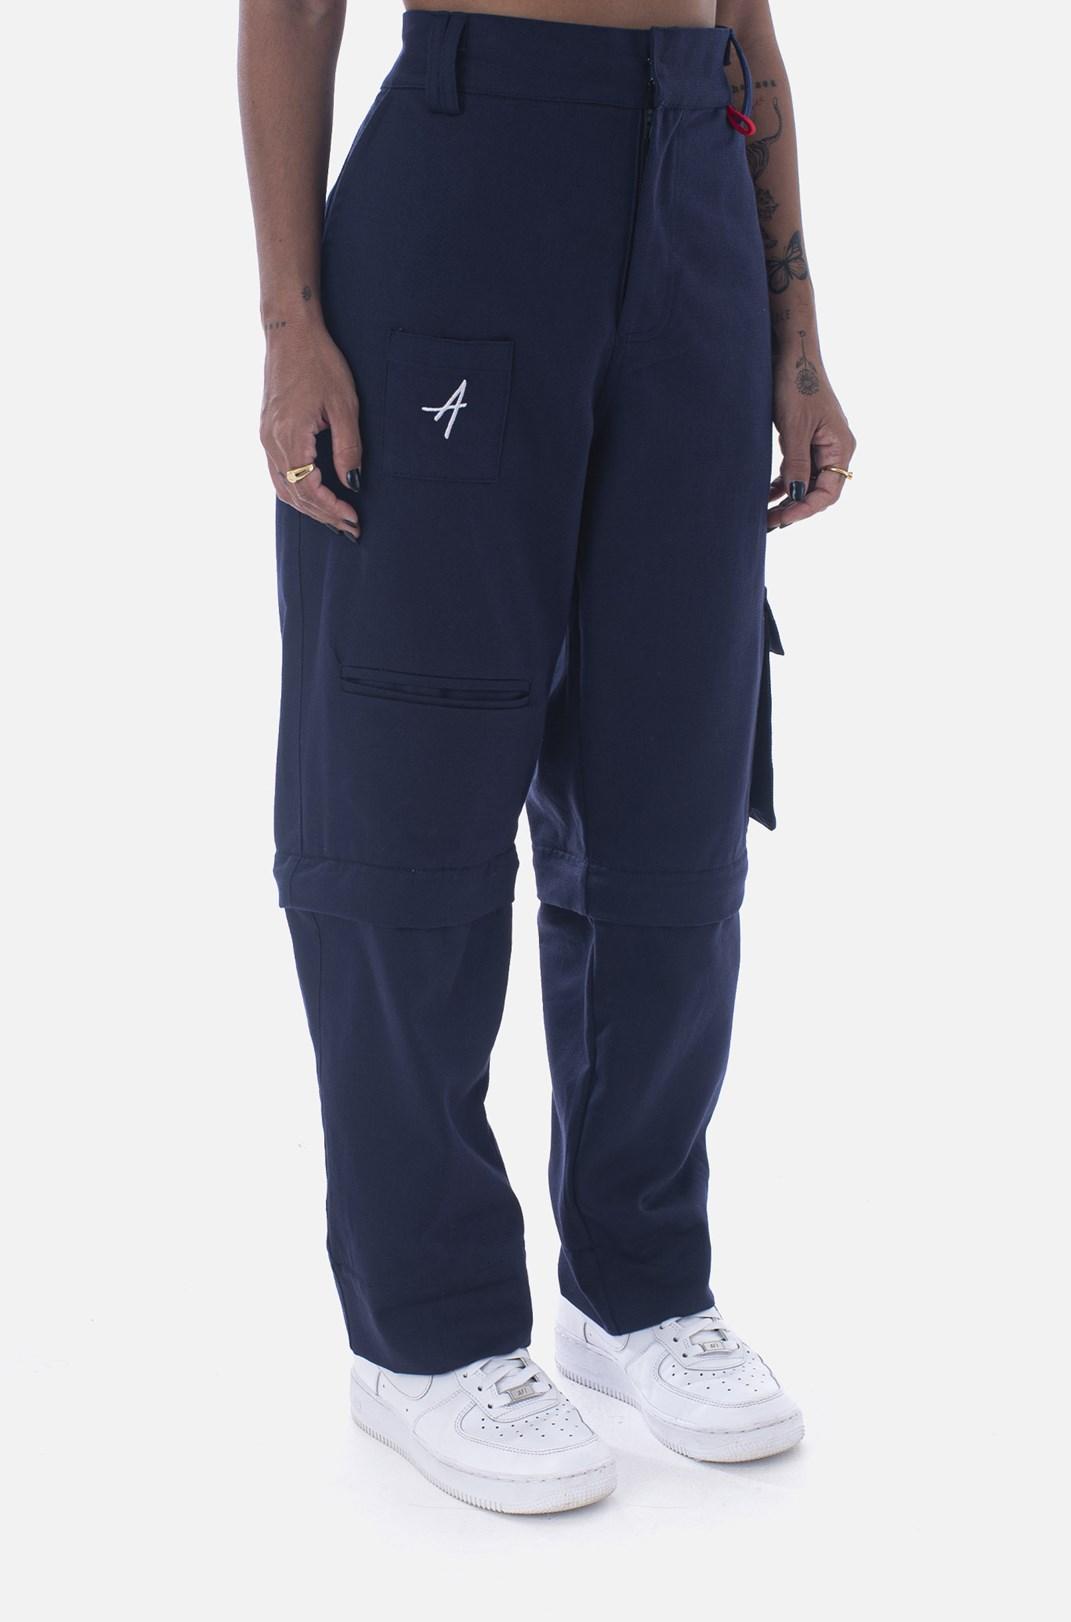 Calça Cargo Approve Workwear Azul Marinho